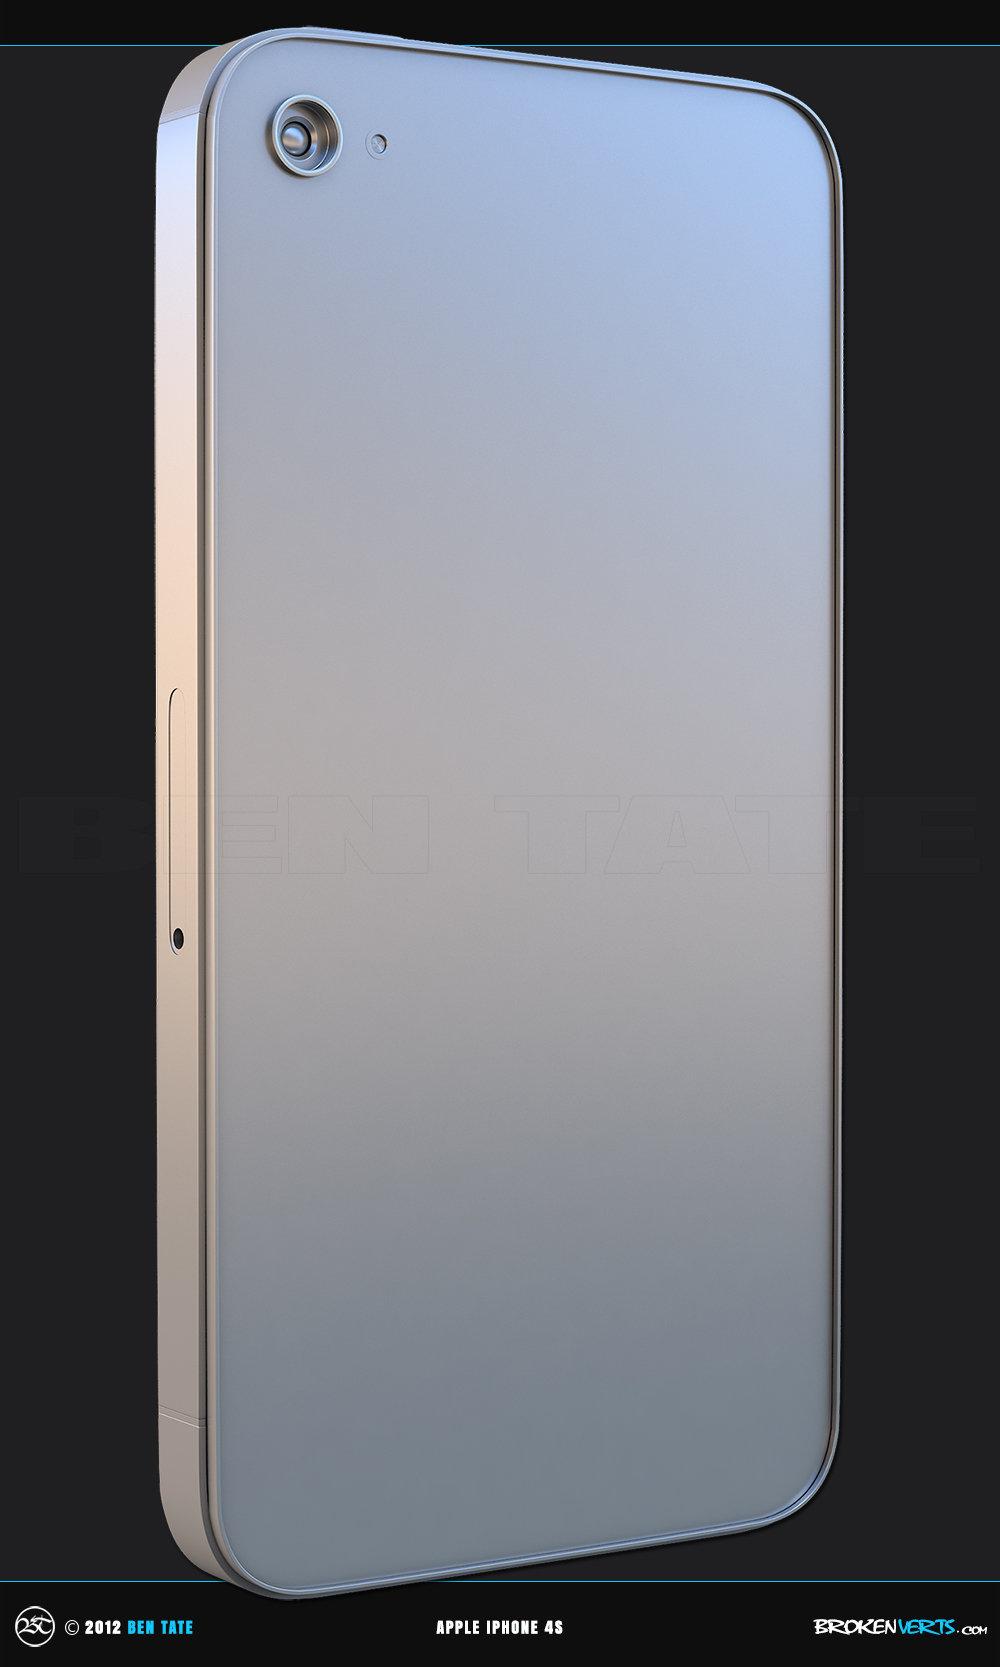 Apple iPhone 4S 3D Model | Ben Tate | Megan Fox | 3ds Max V-Ray Photoshop |3d CG VFX